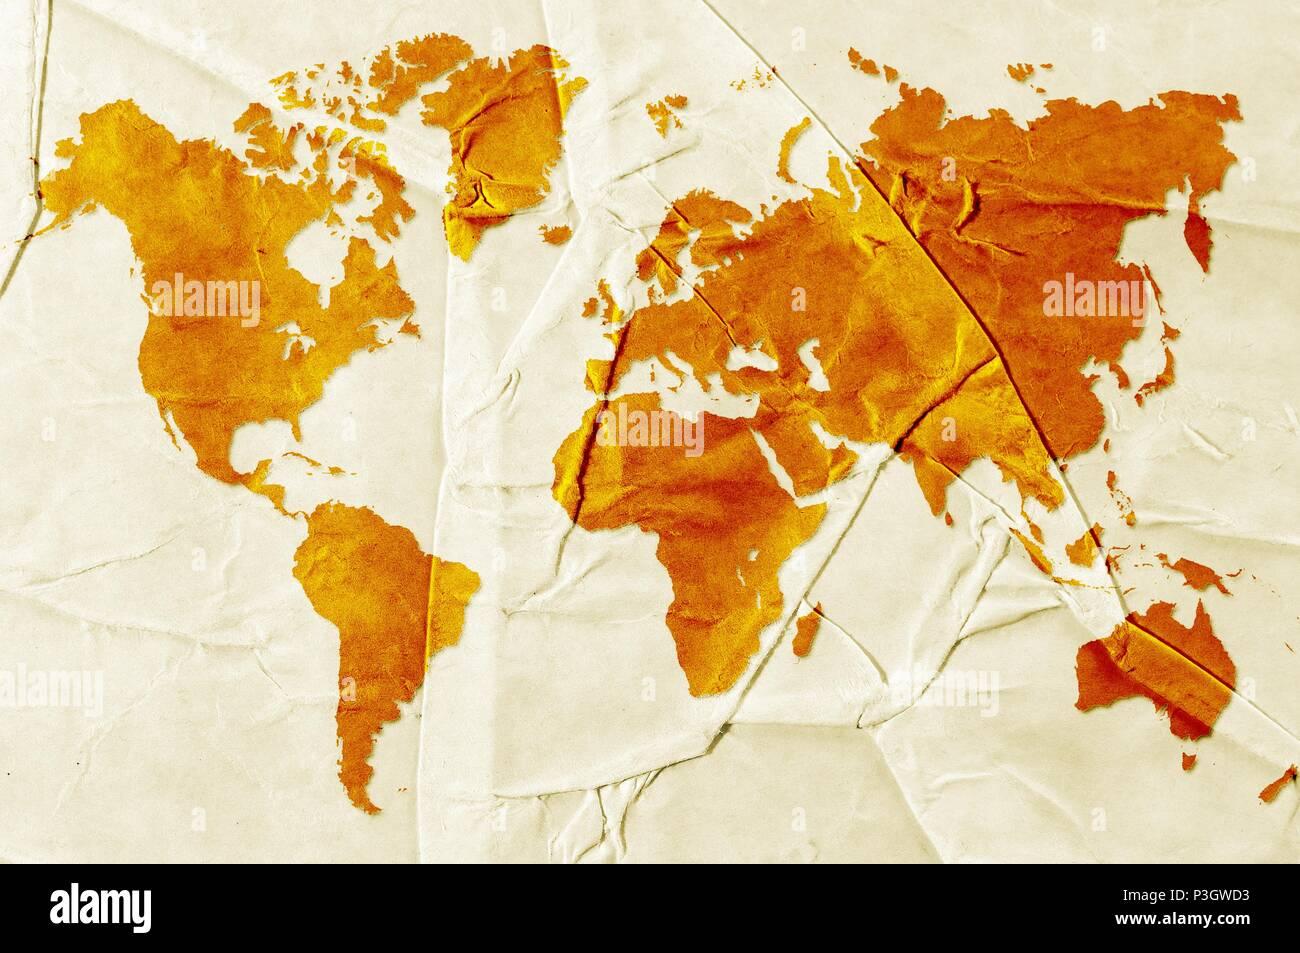 Sepia Map Stock Photos Sepia Map Stock Images Alamy - World map sepia toned